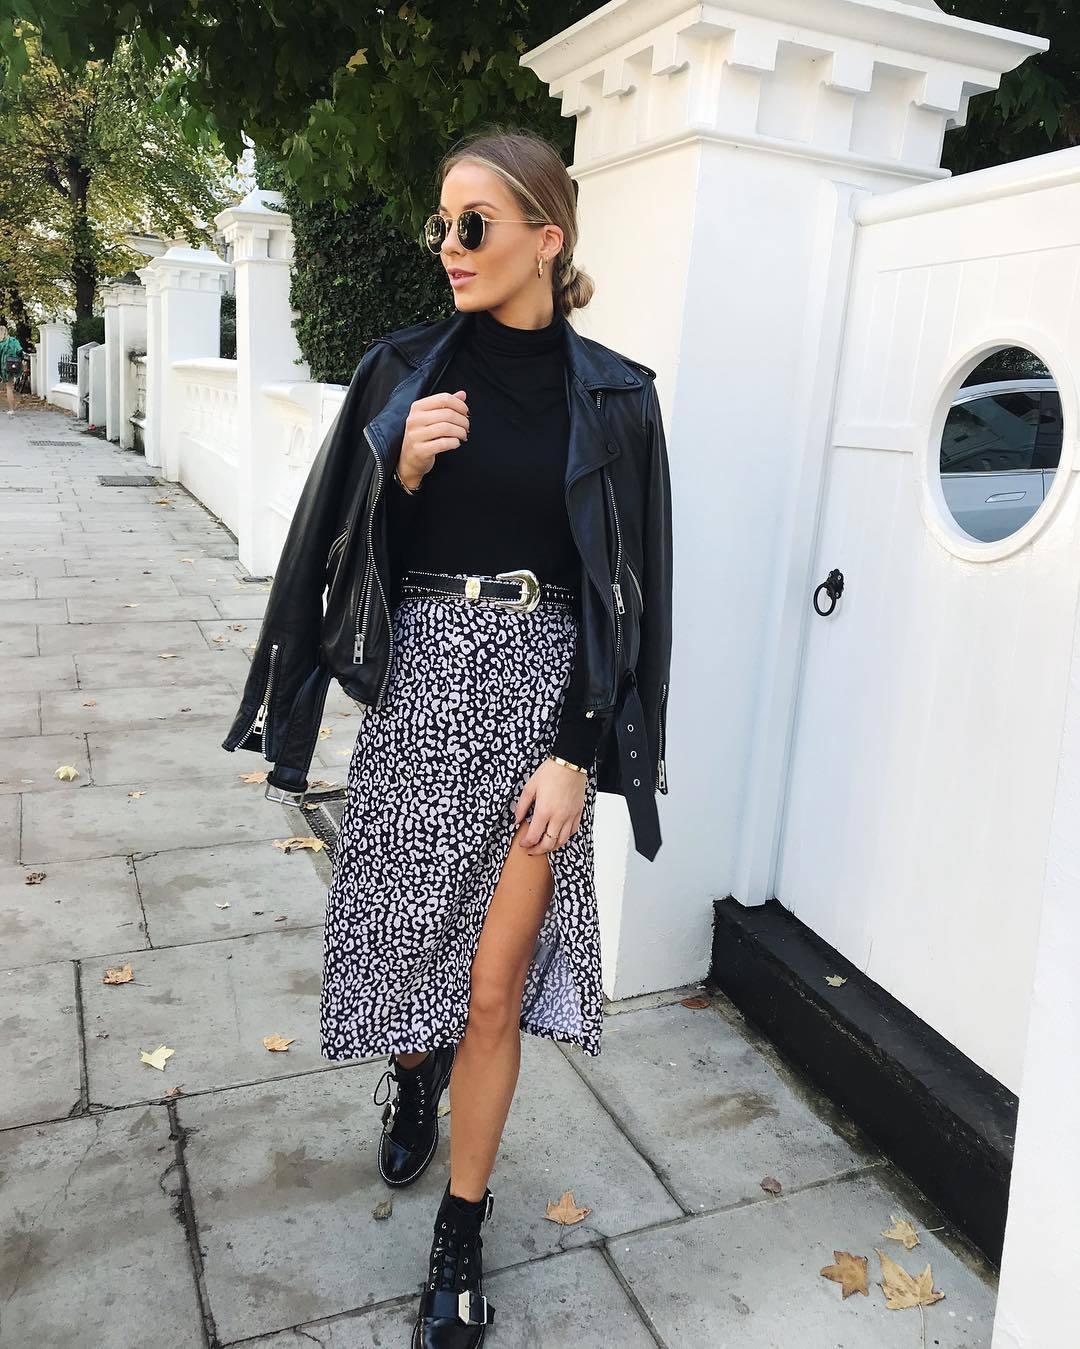 skirt midi skirt leopard print black and white slit dress wrap skirt black boots lace up boots black leather jacket black belt black turtleneck top